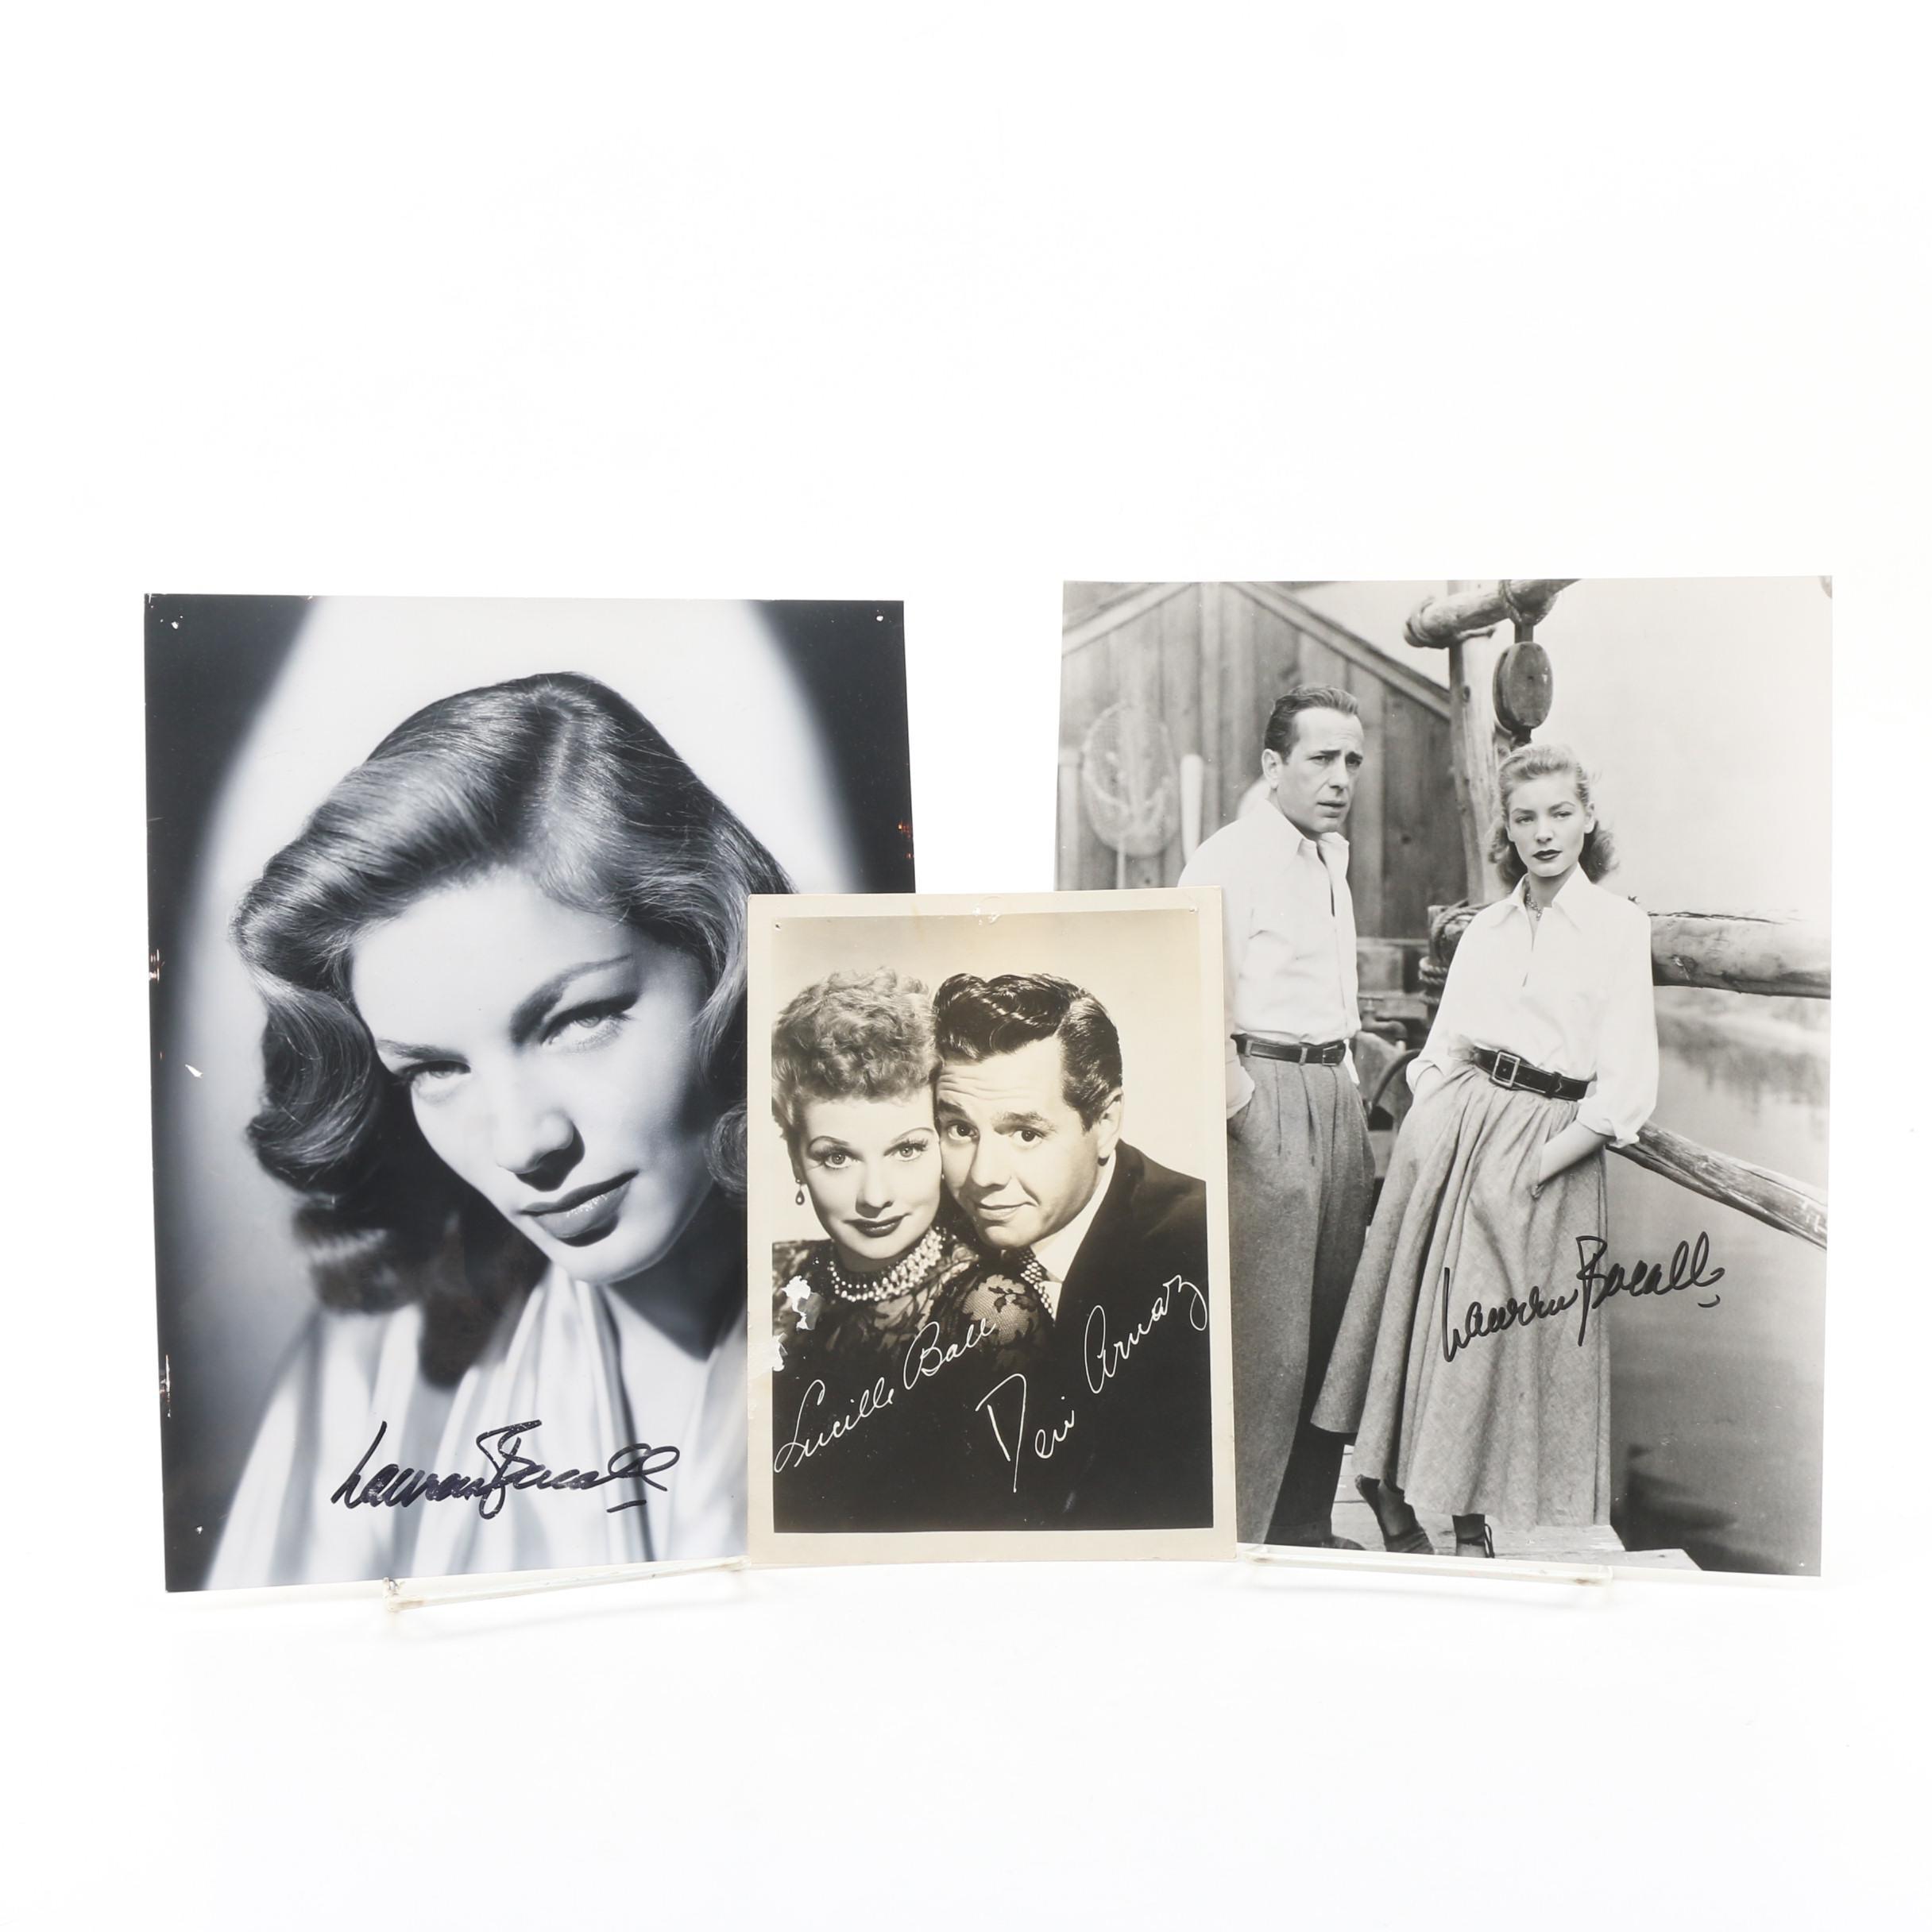 Lauren Bacall Autographed Photographs